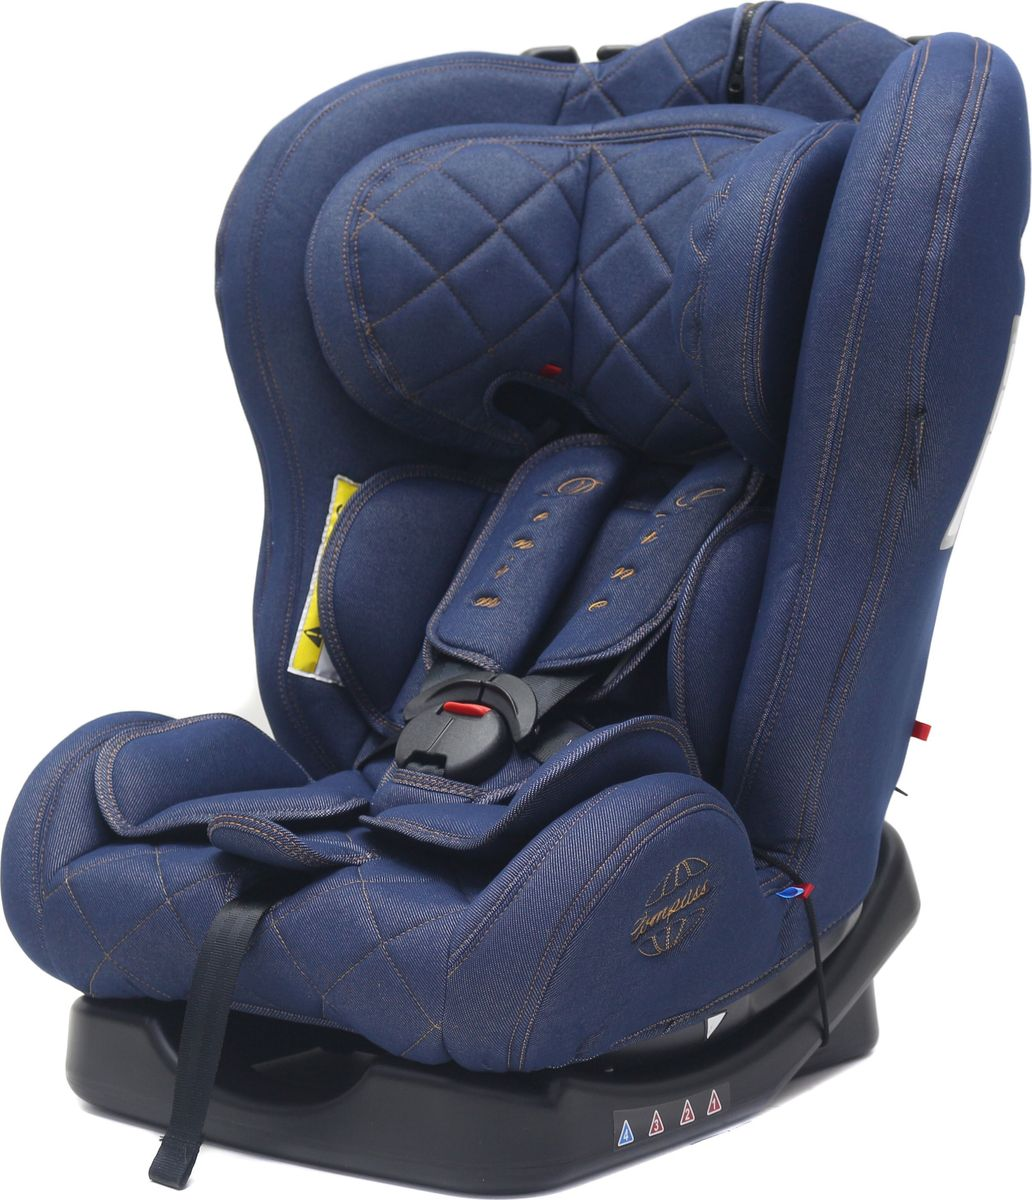 Rant Автокресло Compass Denim Line цвет blue jeans до 25 кг - Автокресла и аксессуары